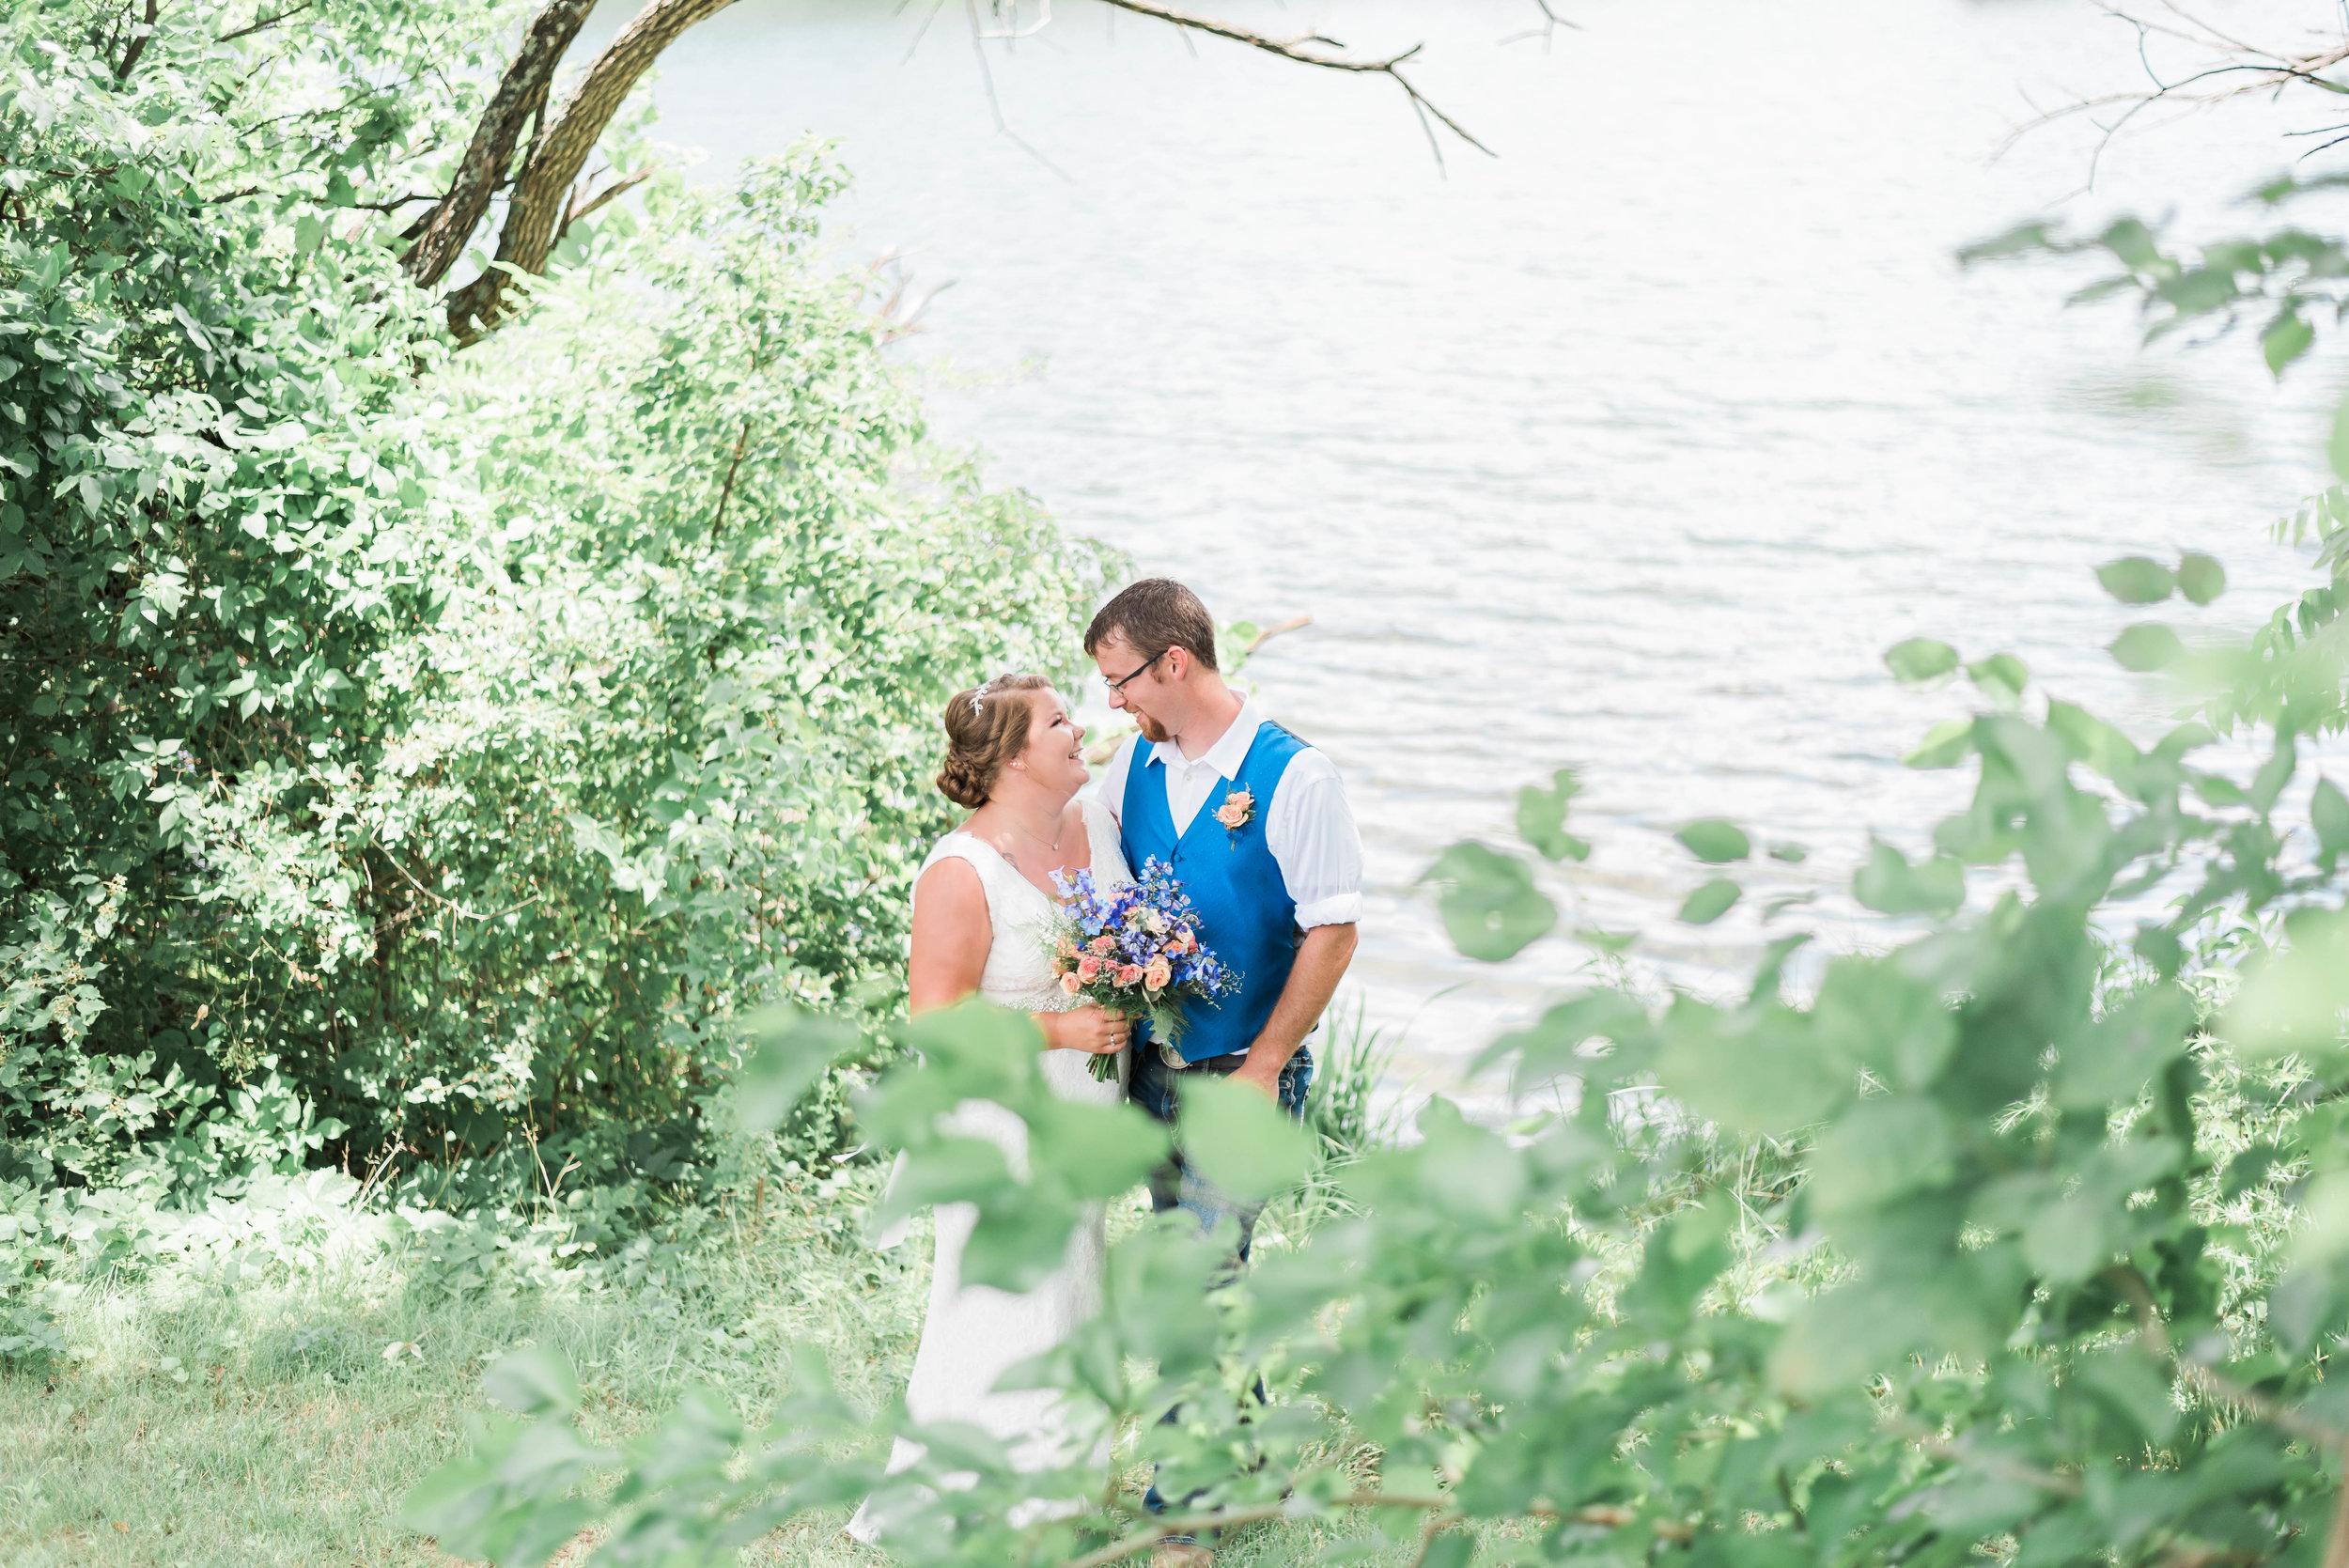 bride and groom romantic gaze